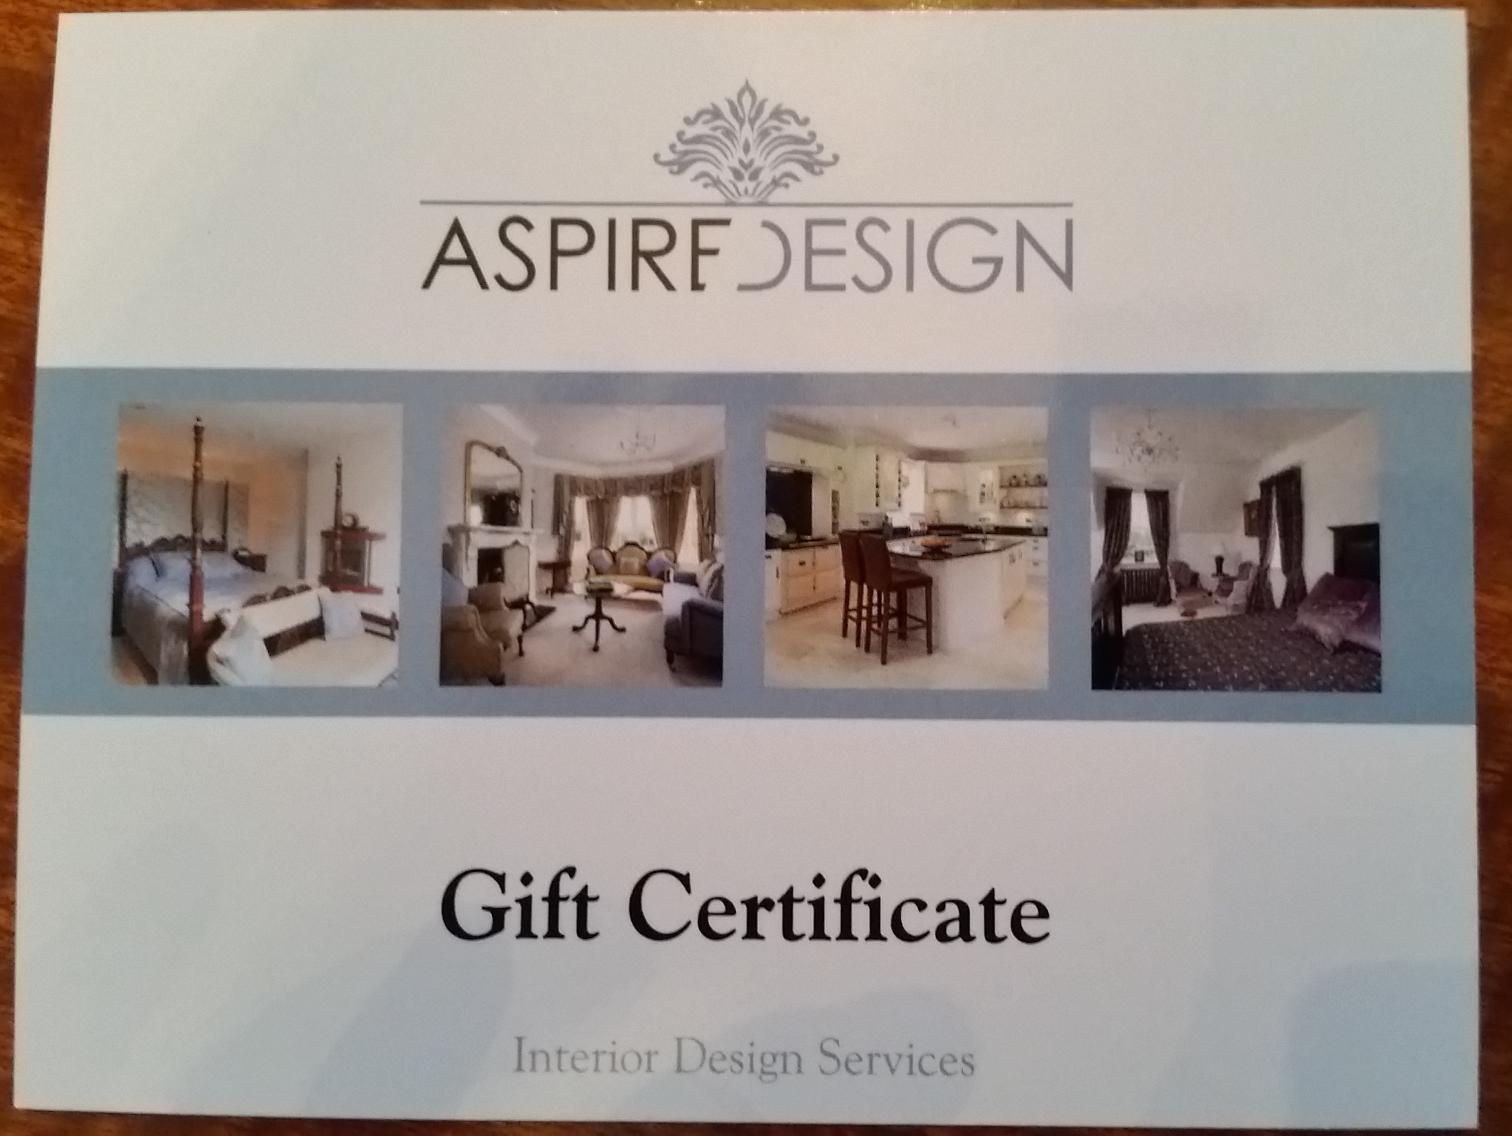 Home renovate voucher aspire design for Certification in interior design